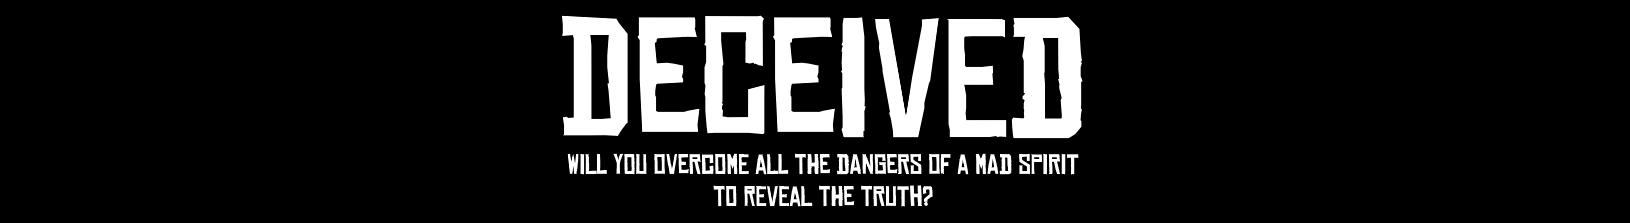 DECEIVED - CGJ19